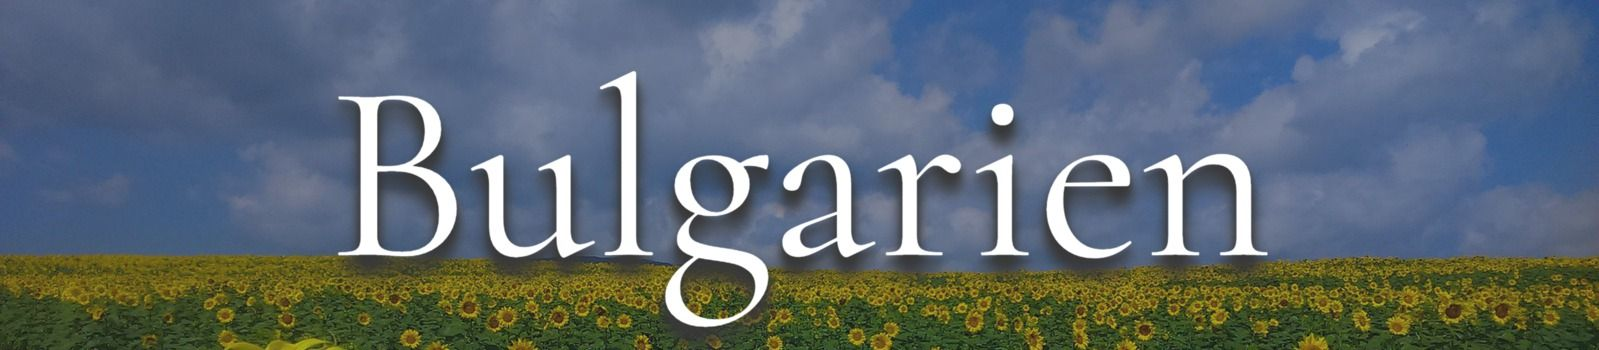 Bulgarien Banner